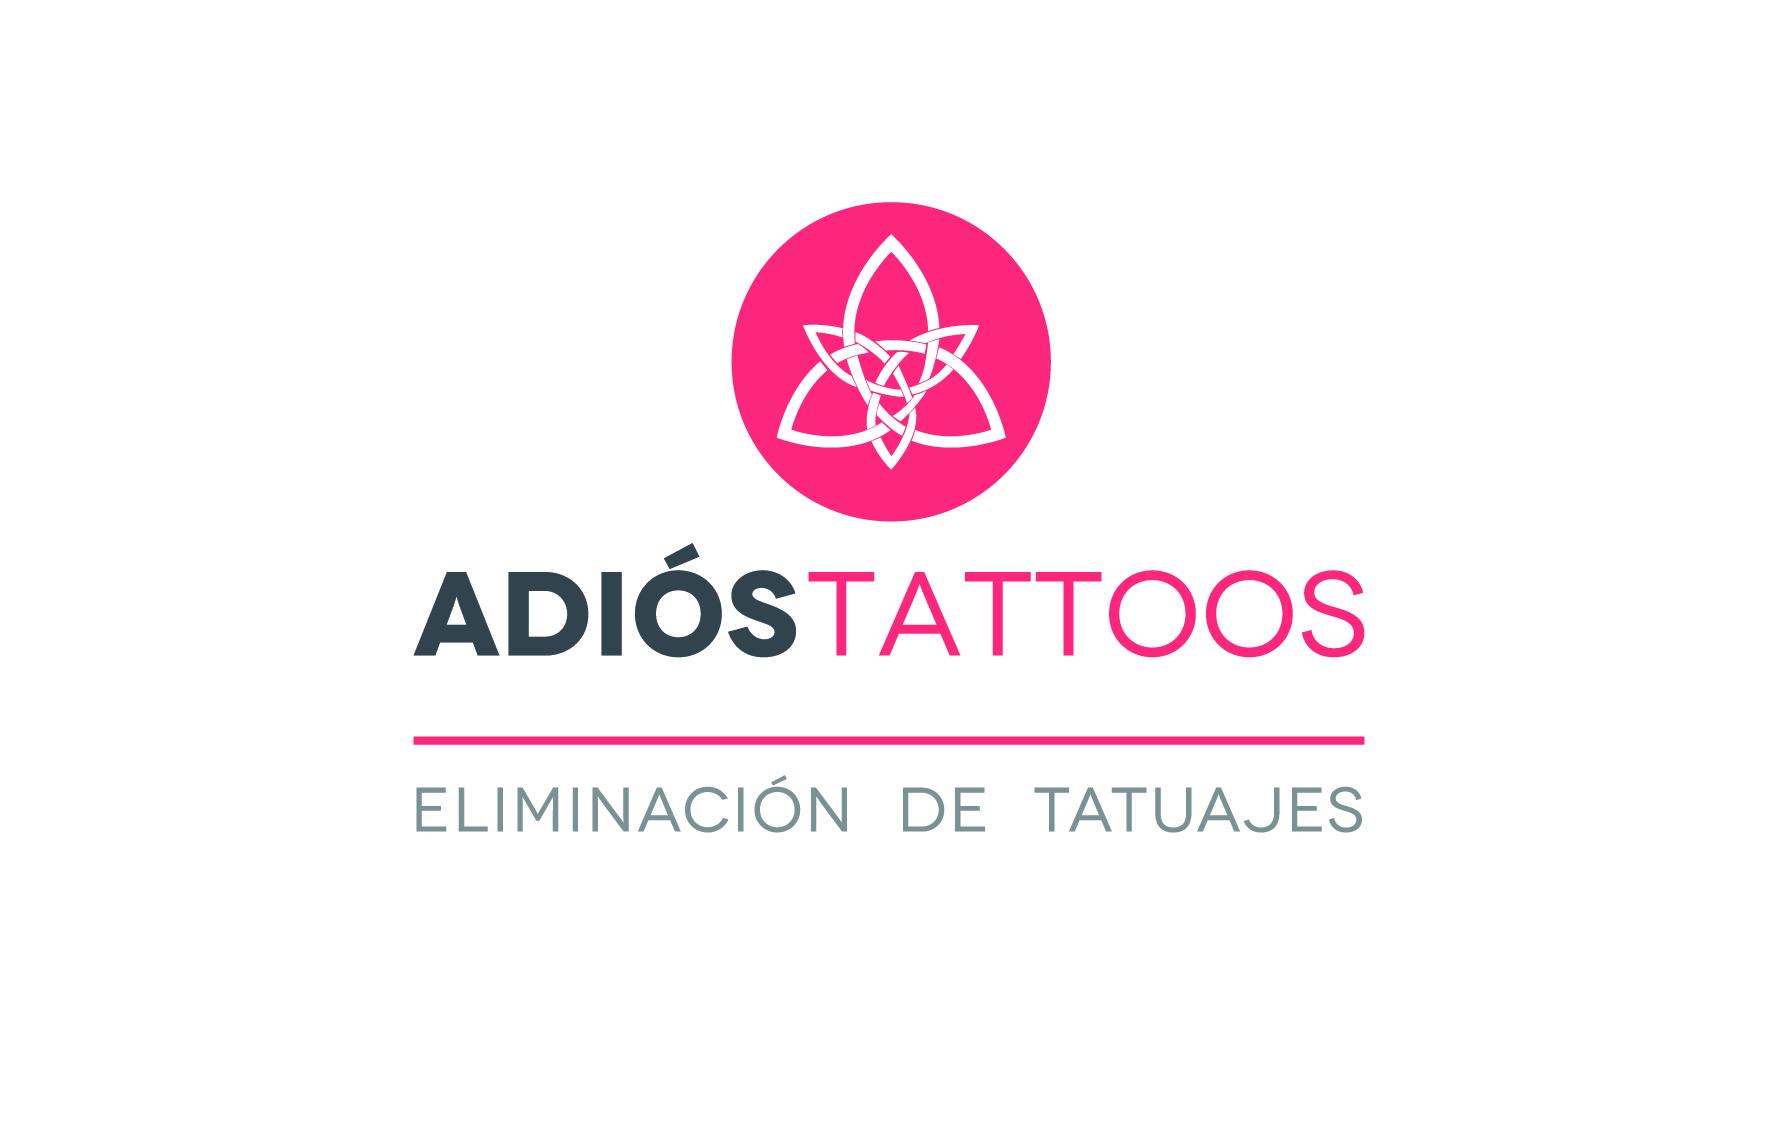 ADIÓS TATTOOS VALENCIA